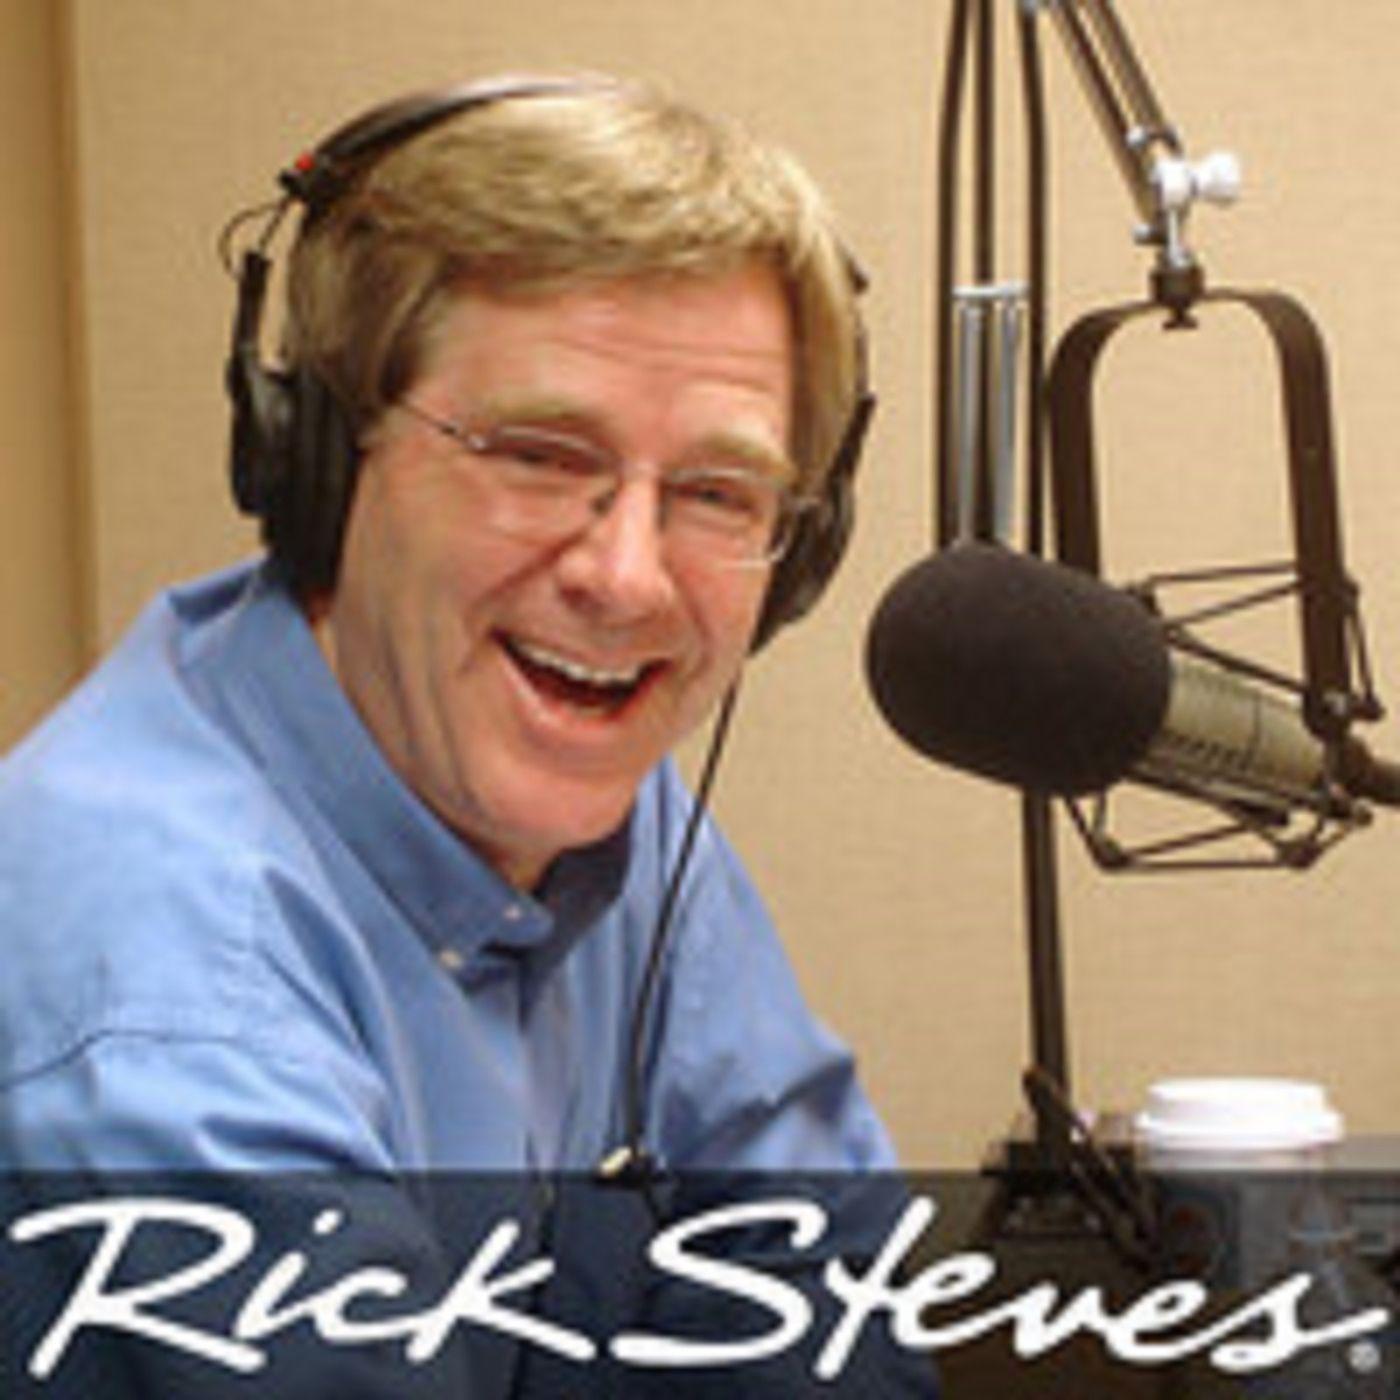 Heartland Newsfeed Radio Network: Travel with Rick Steves (August 24, 2019)